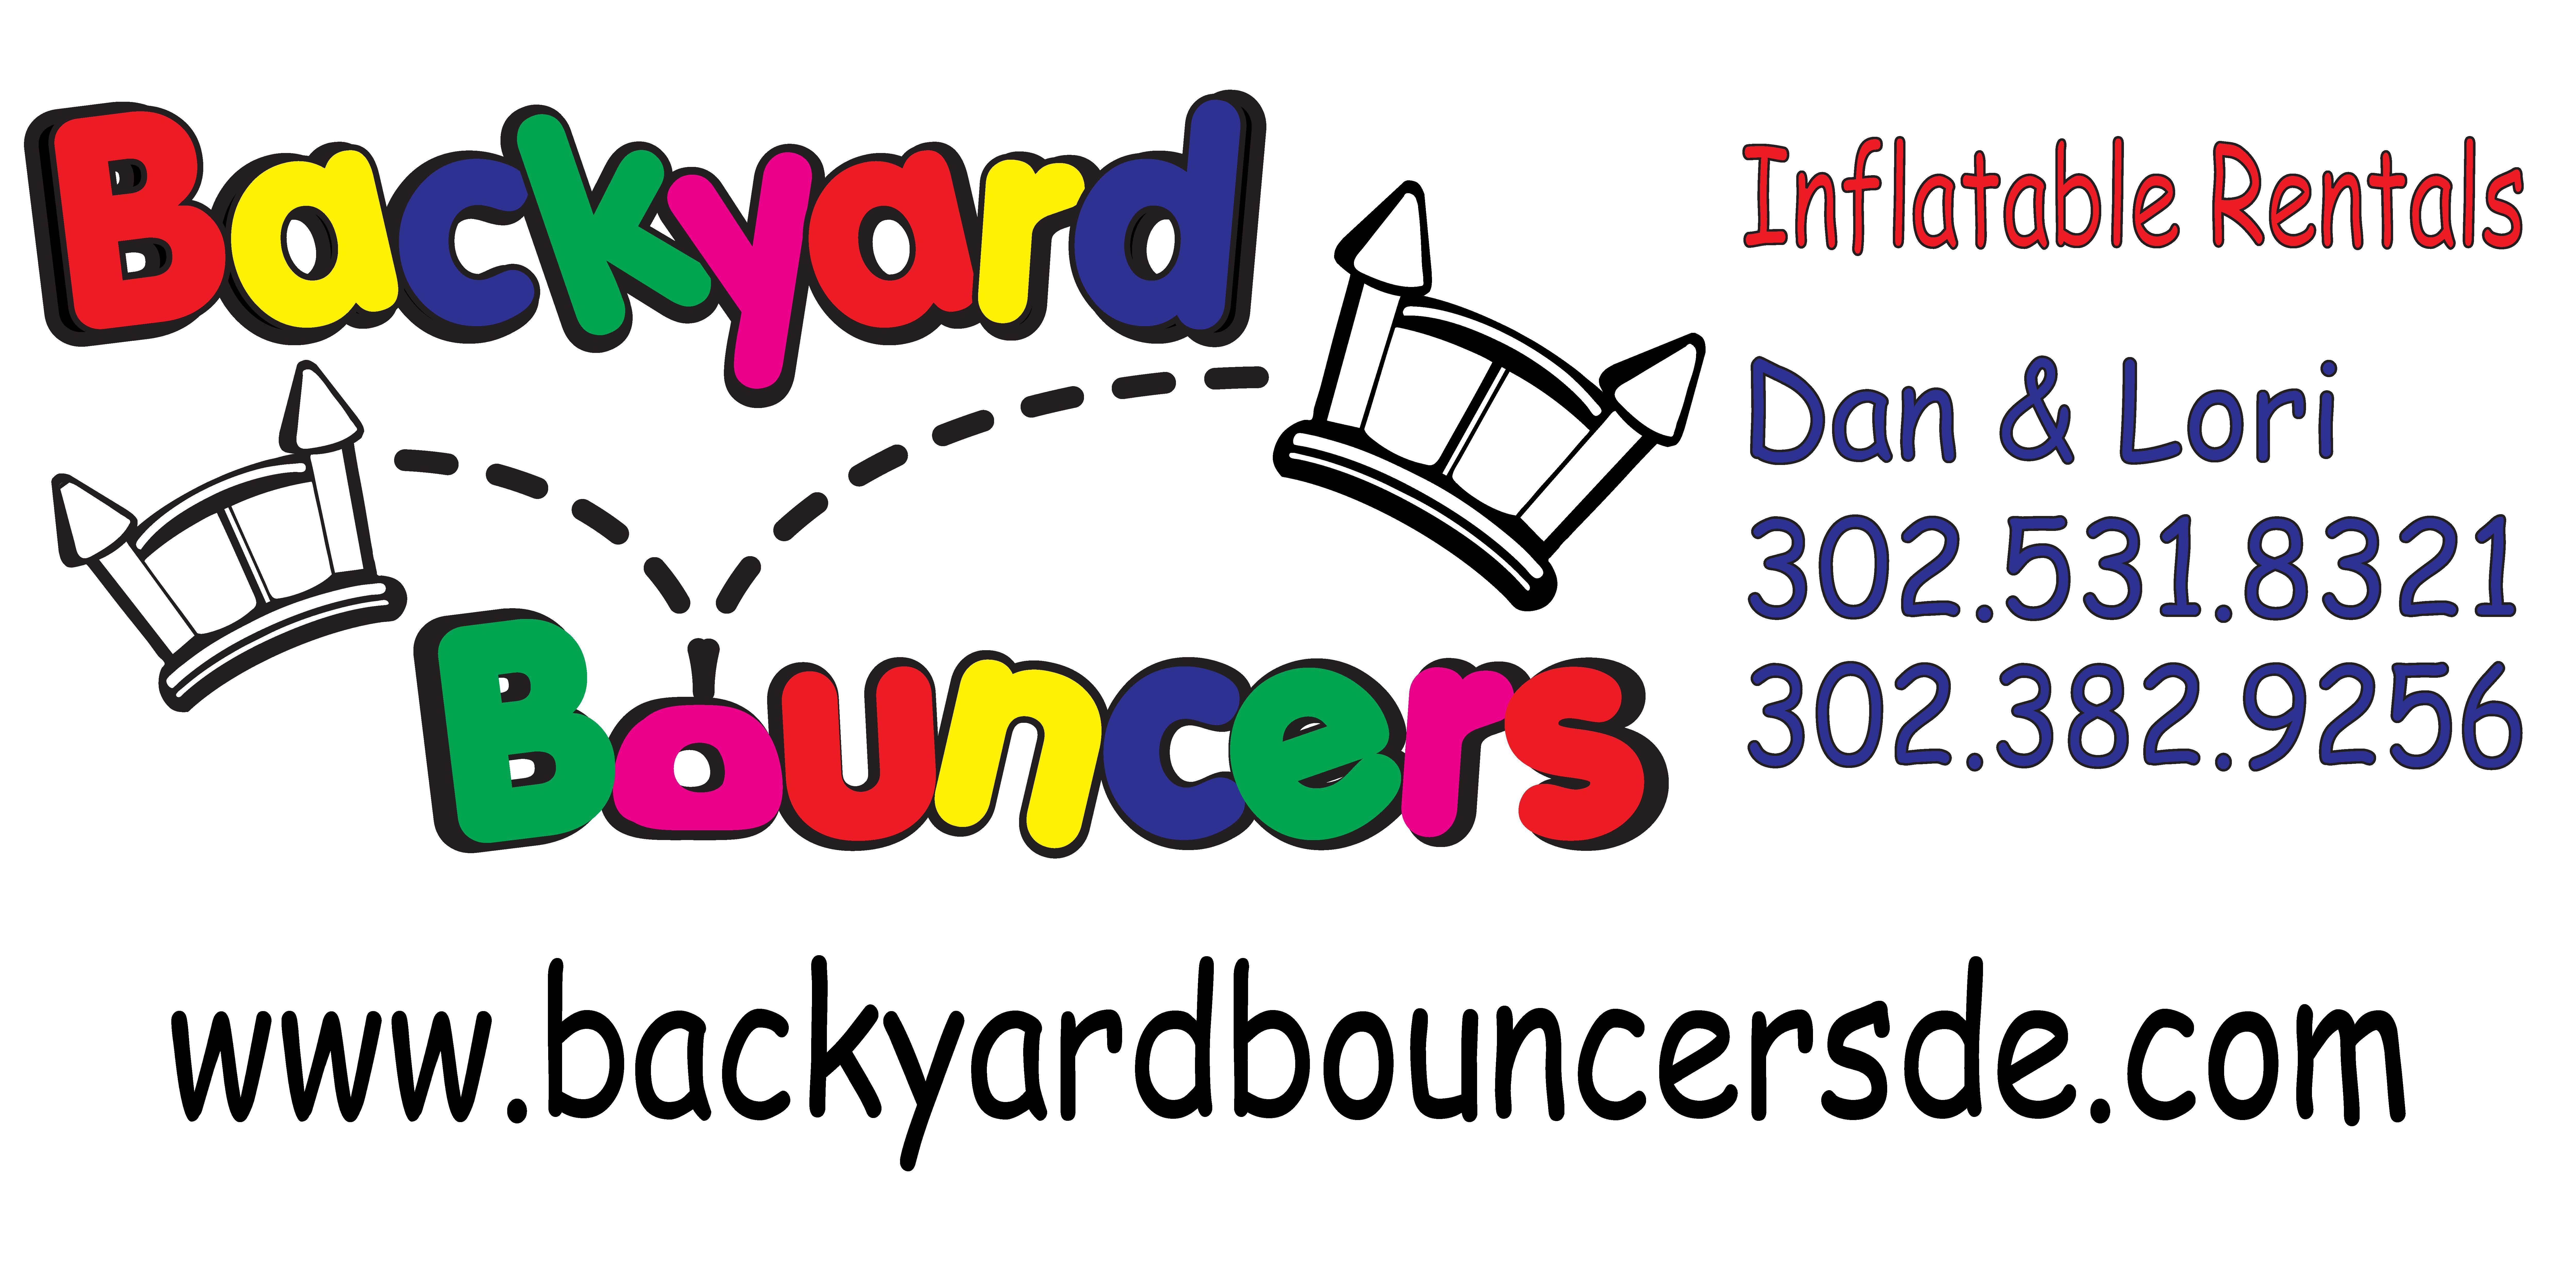 Backyard Bouncers